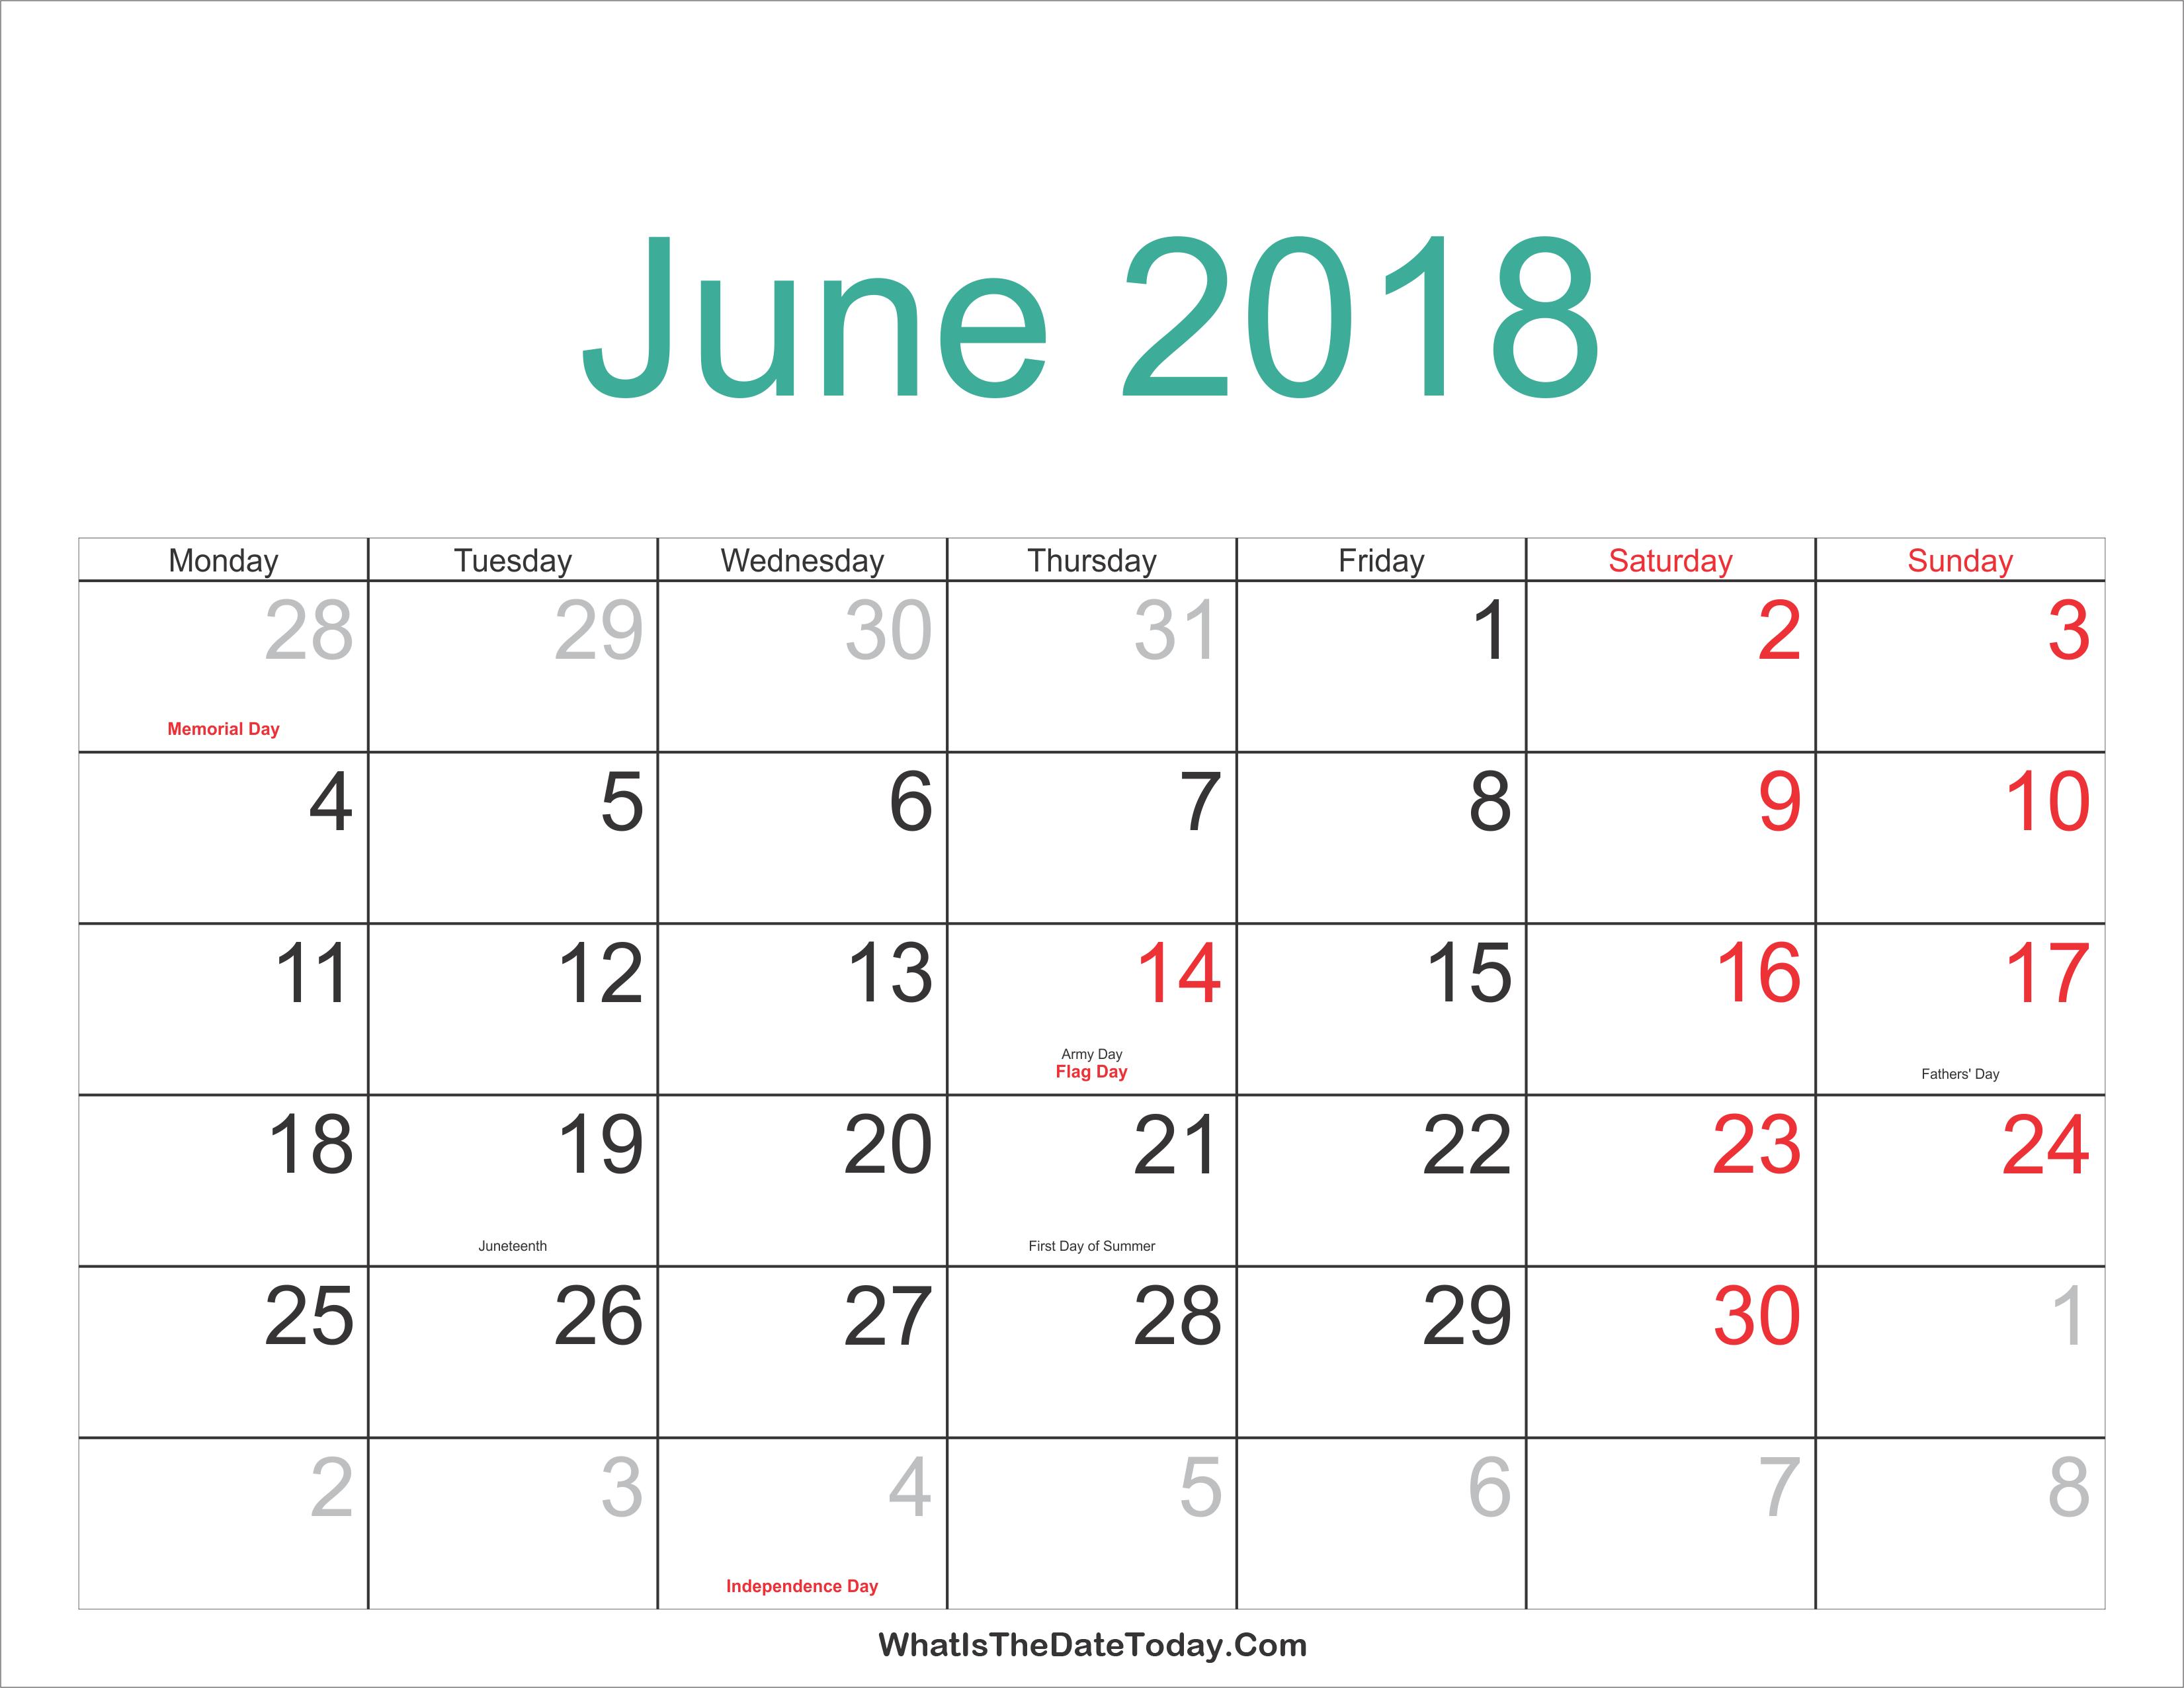 June 2018 Calendar Printable with Holidays | Whatisthedatetoday.Com